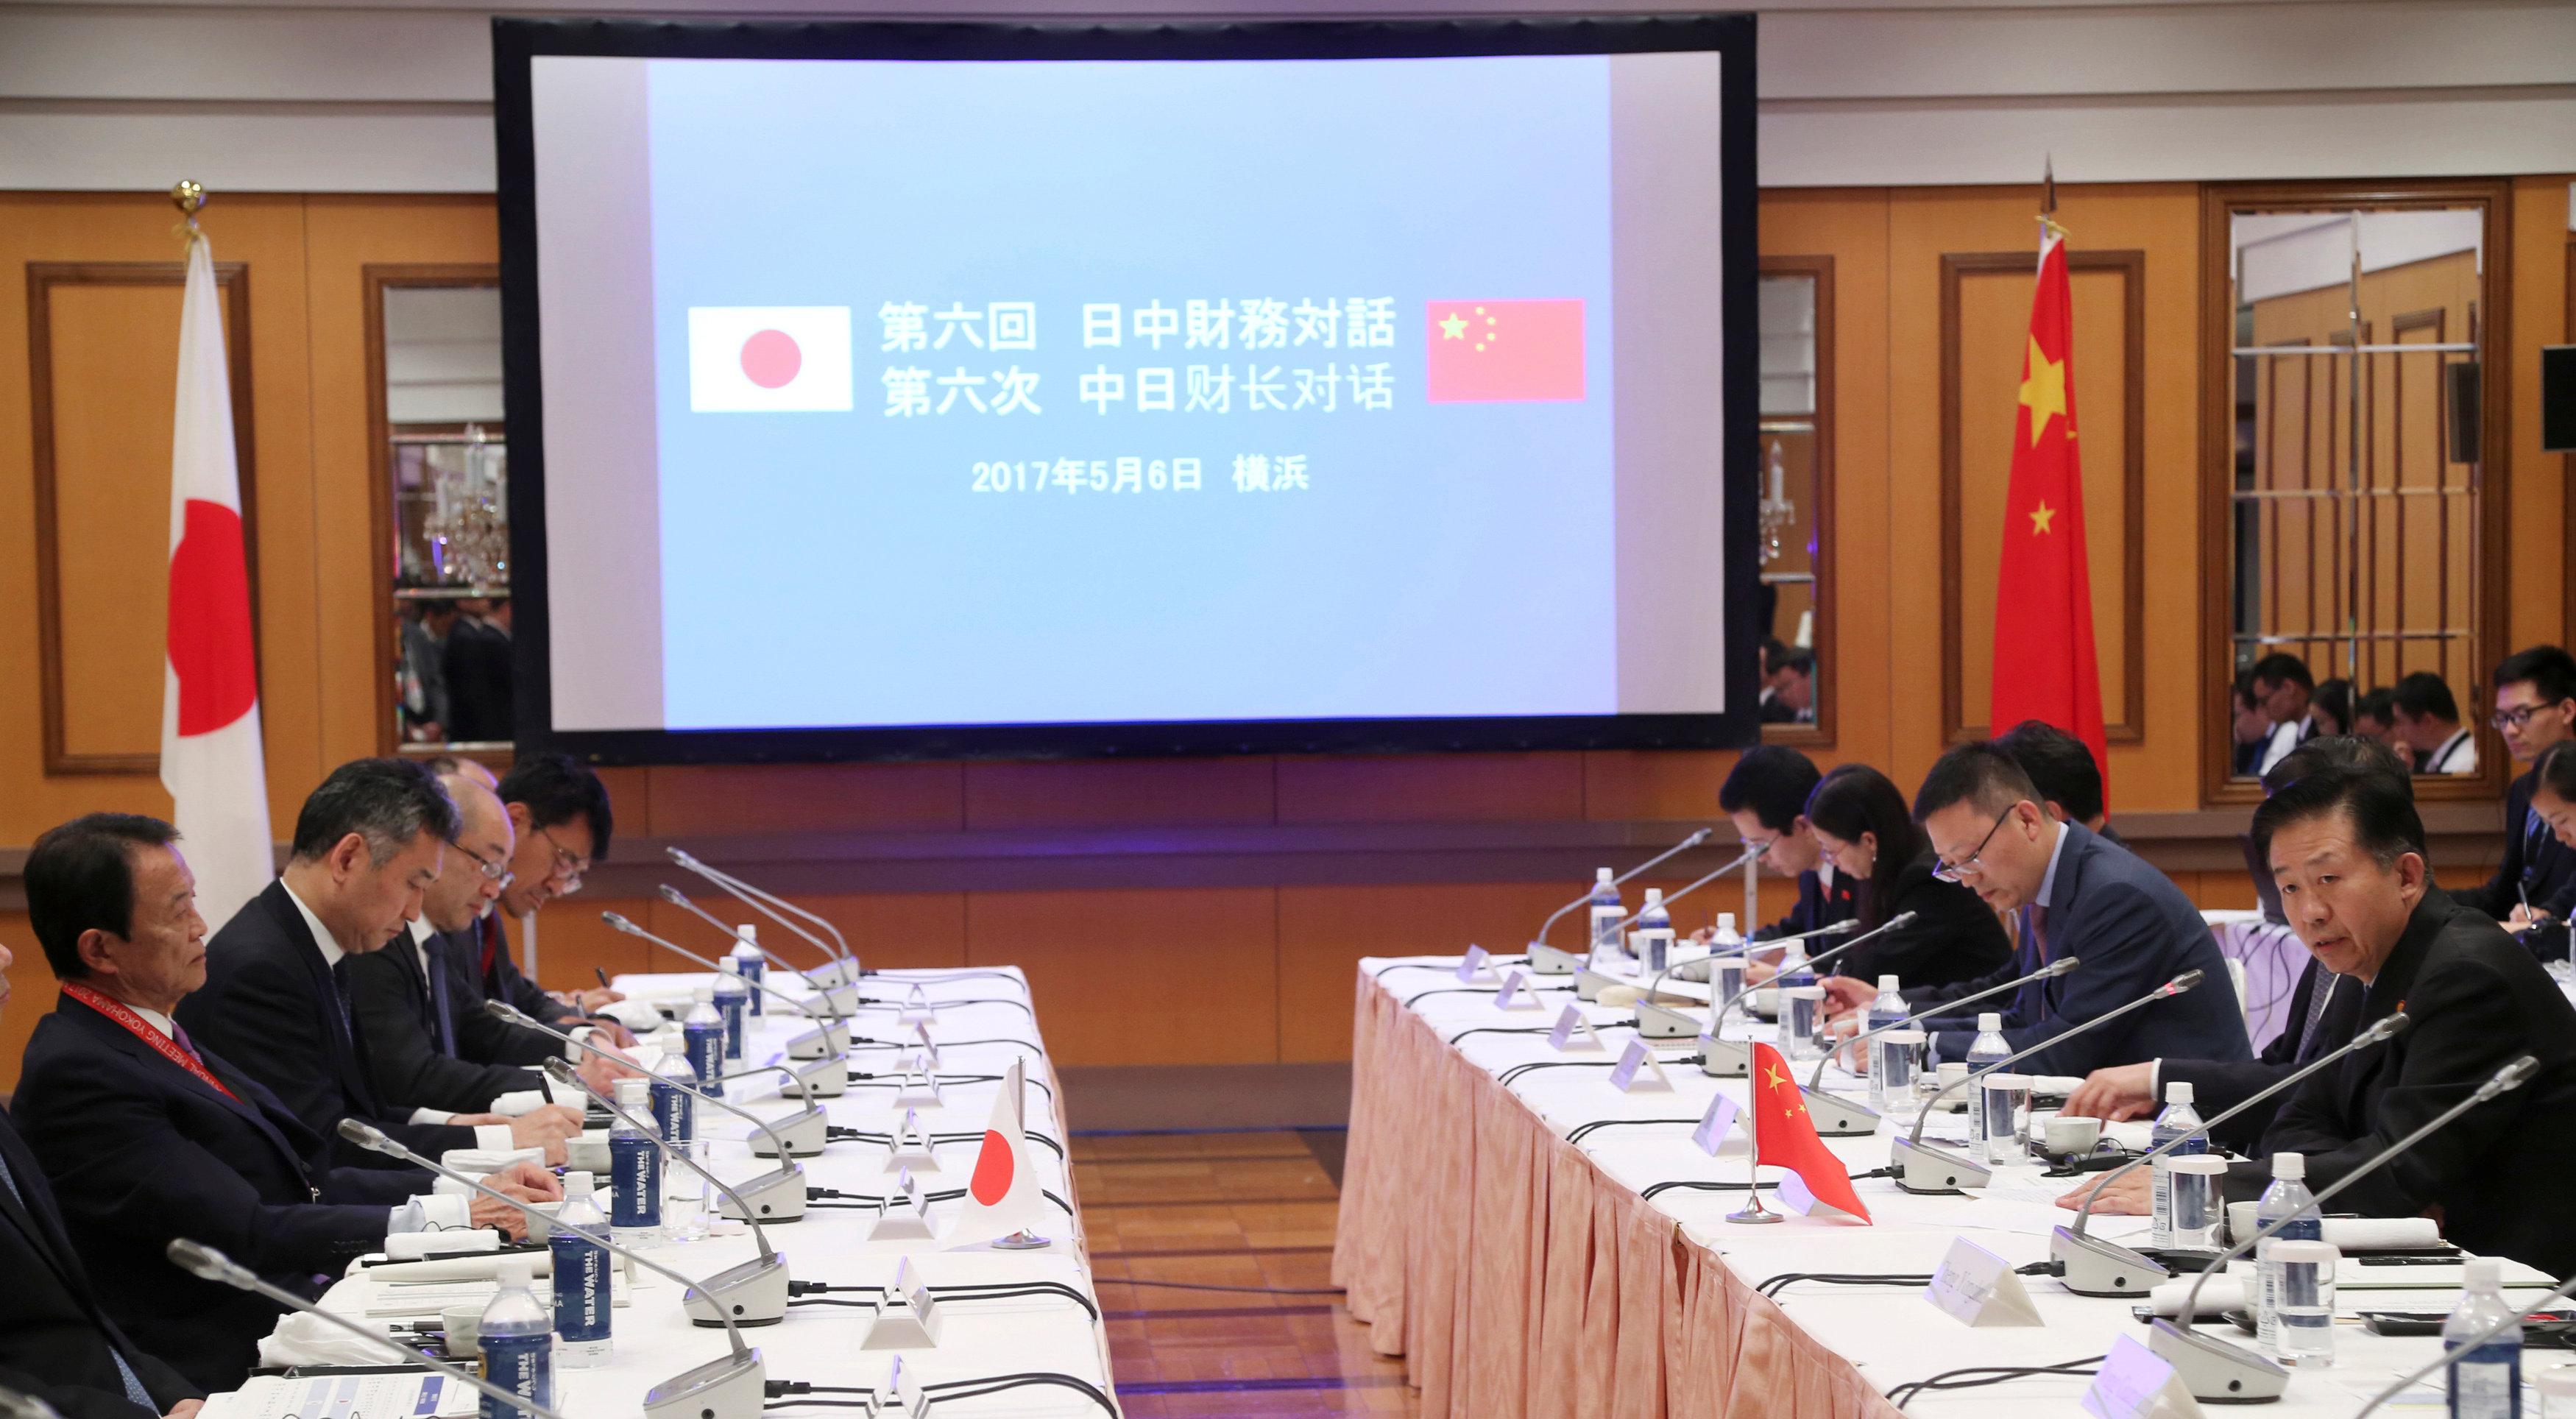 Japan, China to boost financial ties